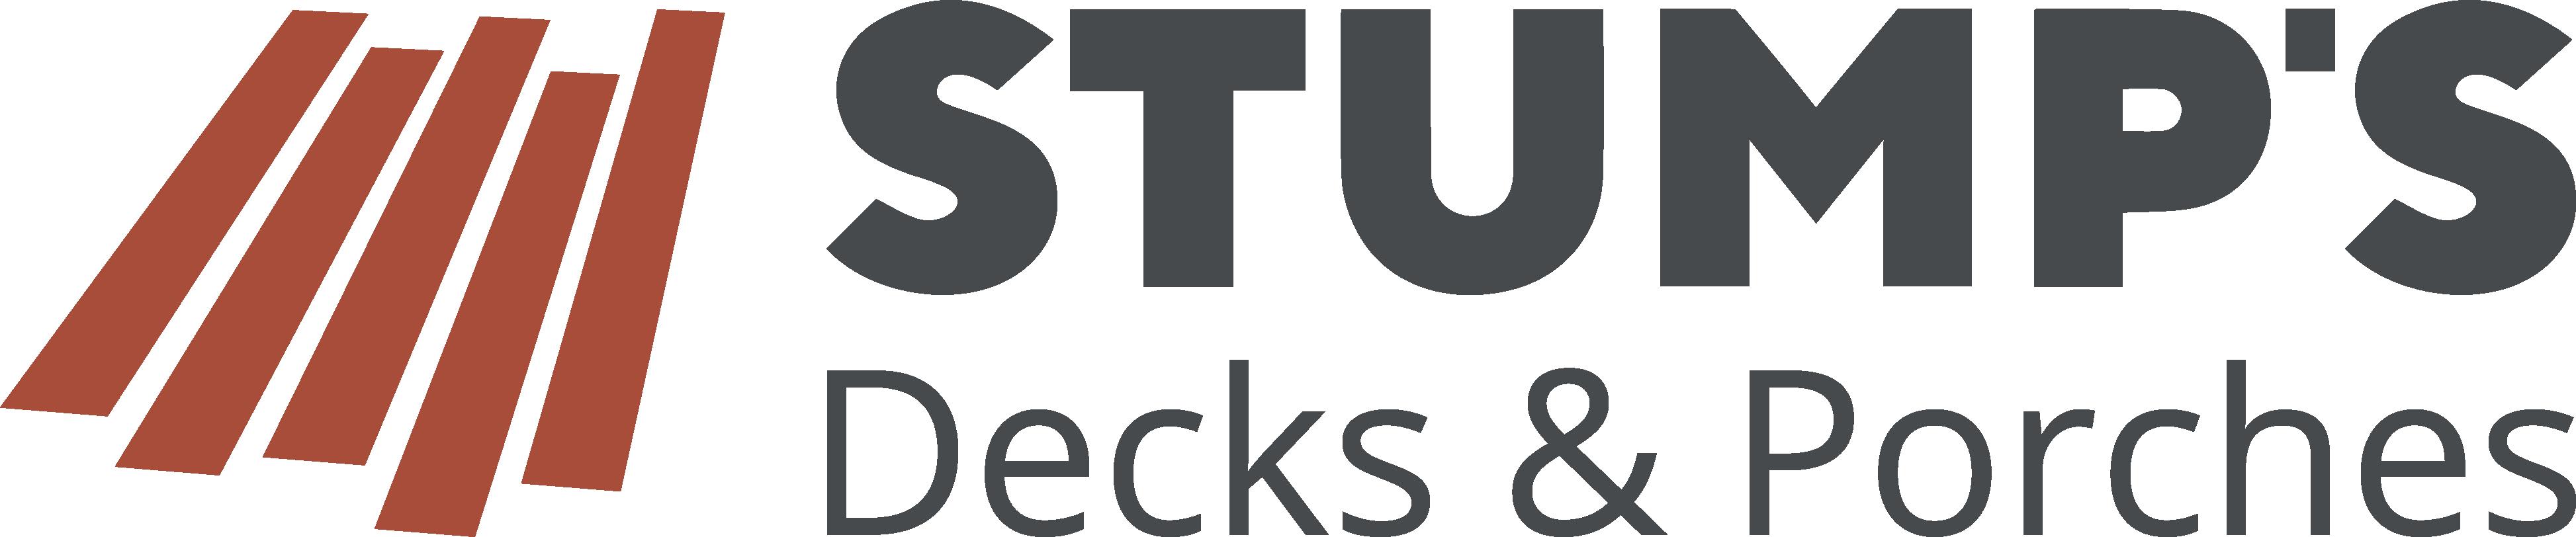 Stump's Decks and Porches logo